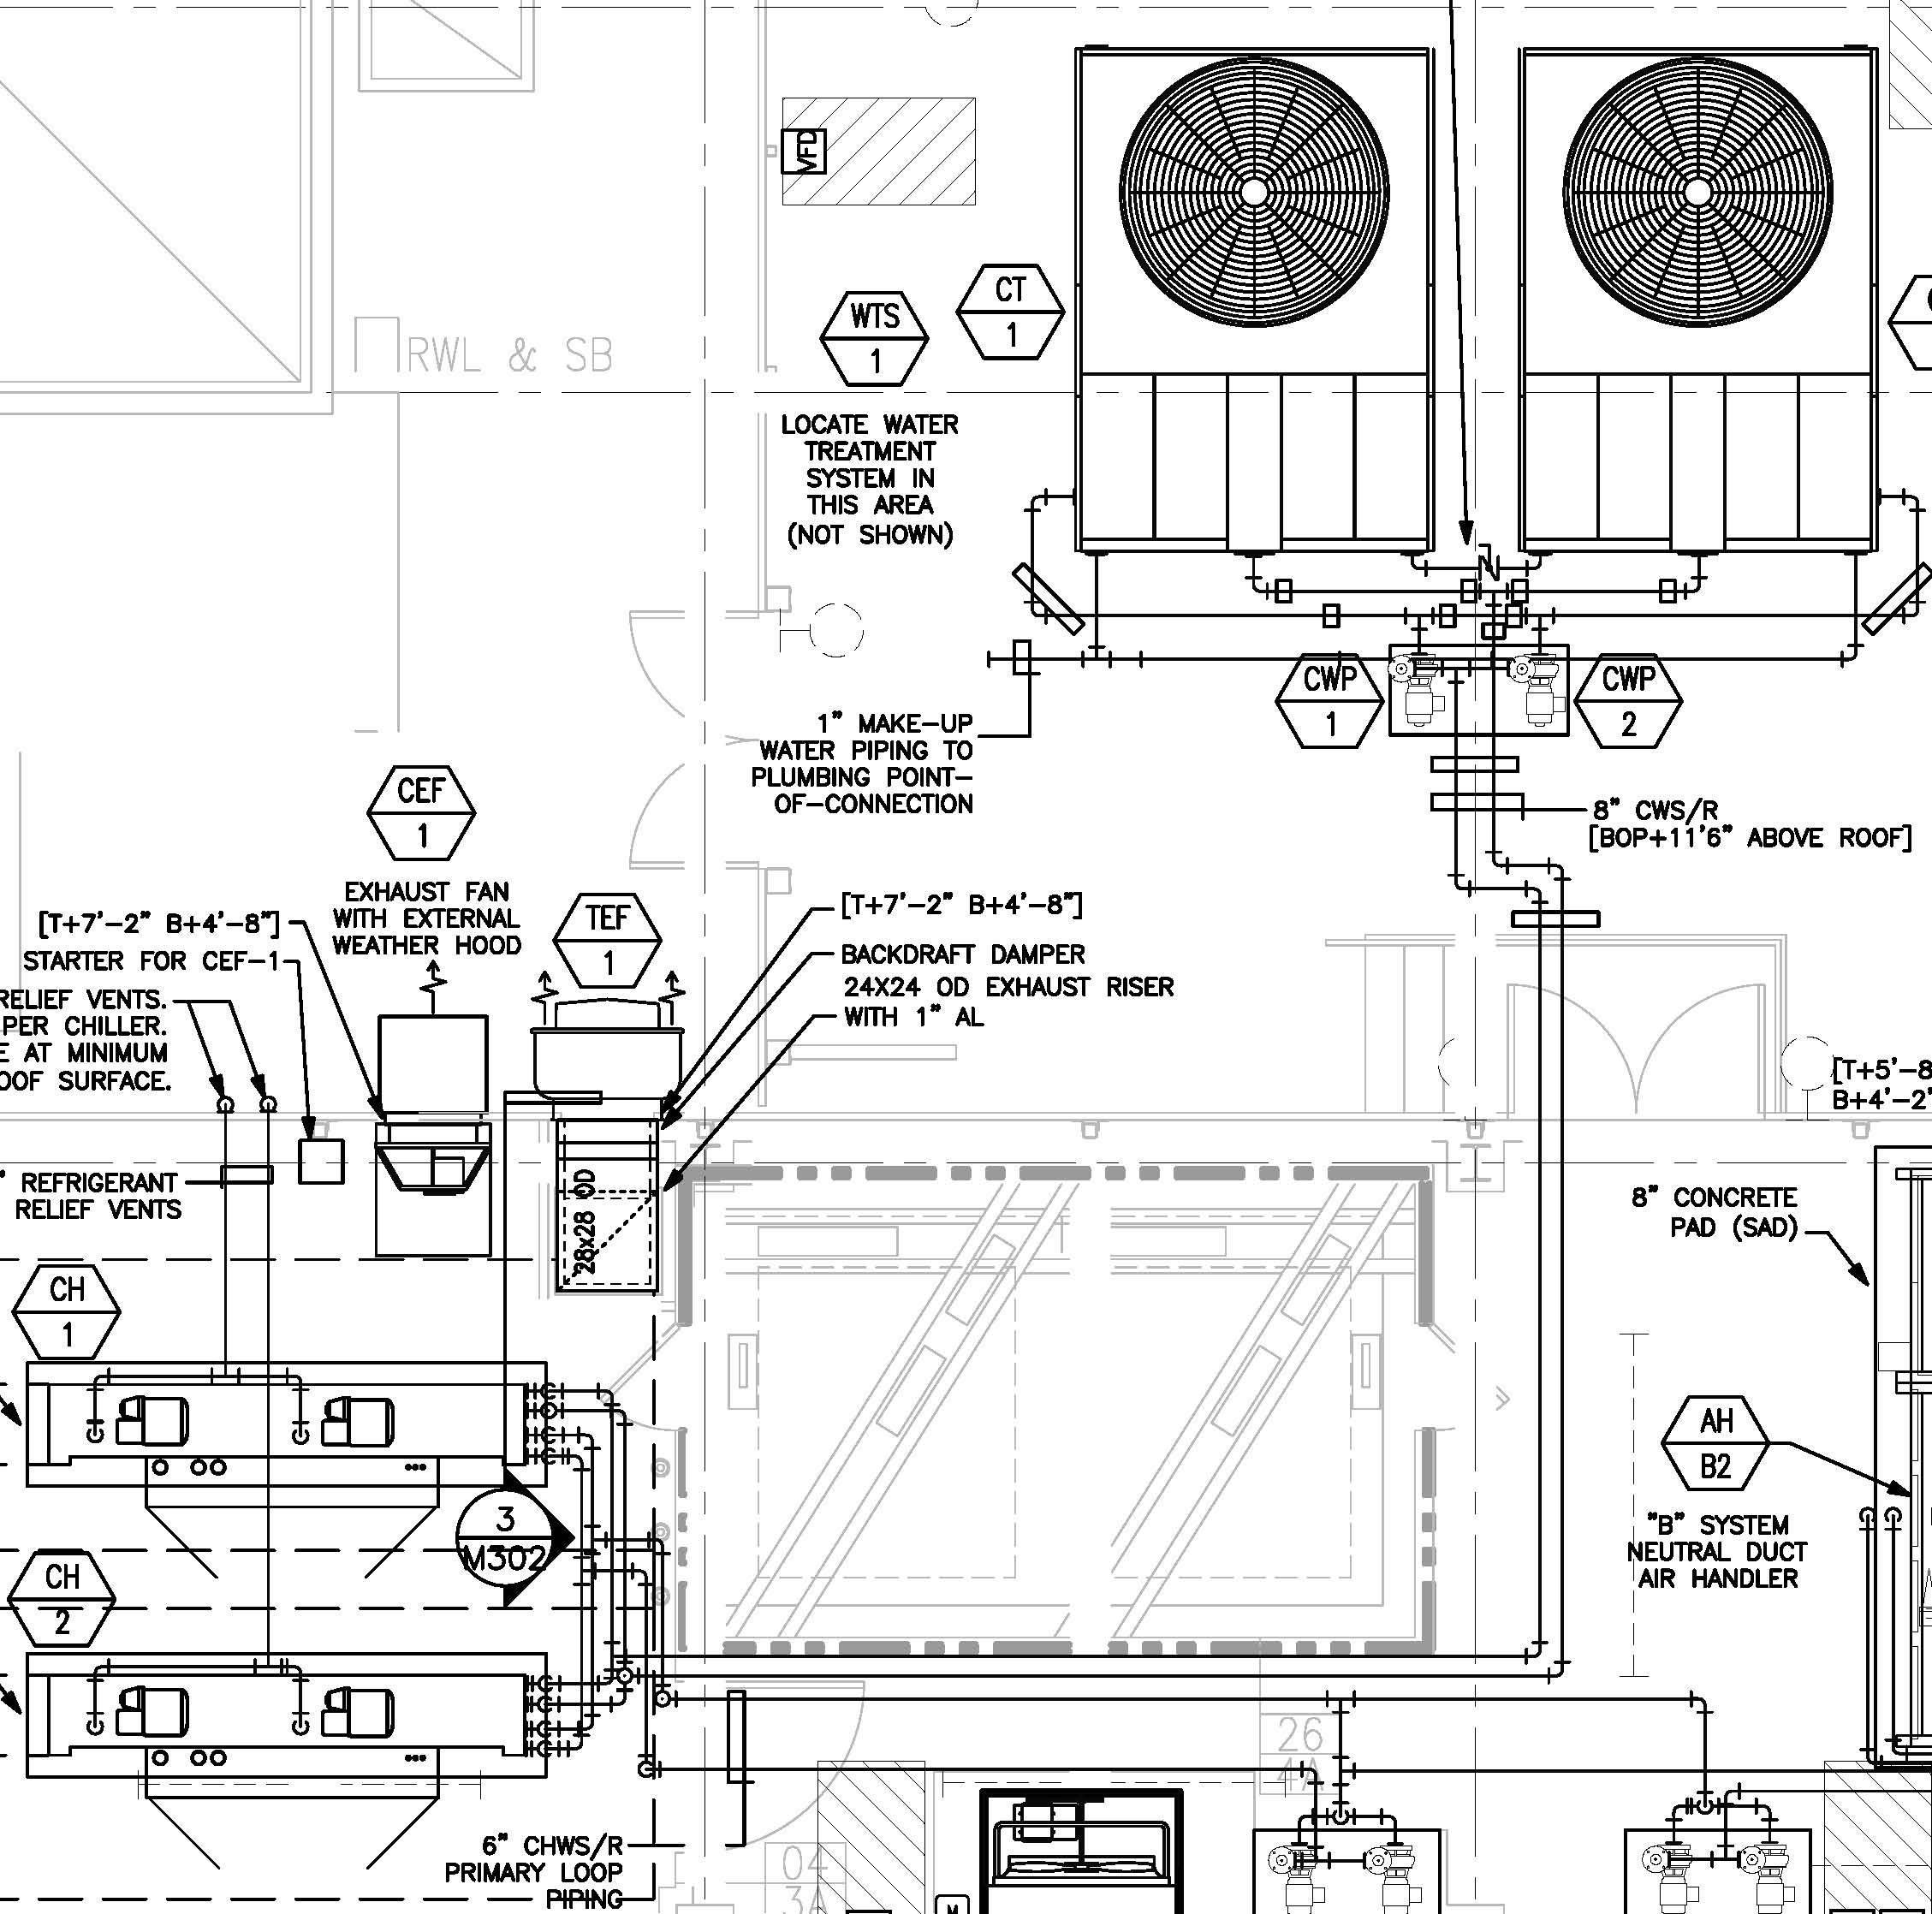 Gas Hot Water Heater Parts Diagram Megaflo Piping Diagram Layout Wiring Diagrams • Of Gas Hot Water Heater Parts Diagram